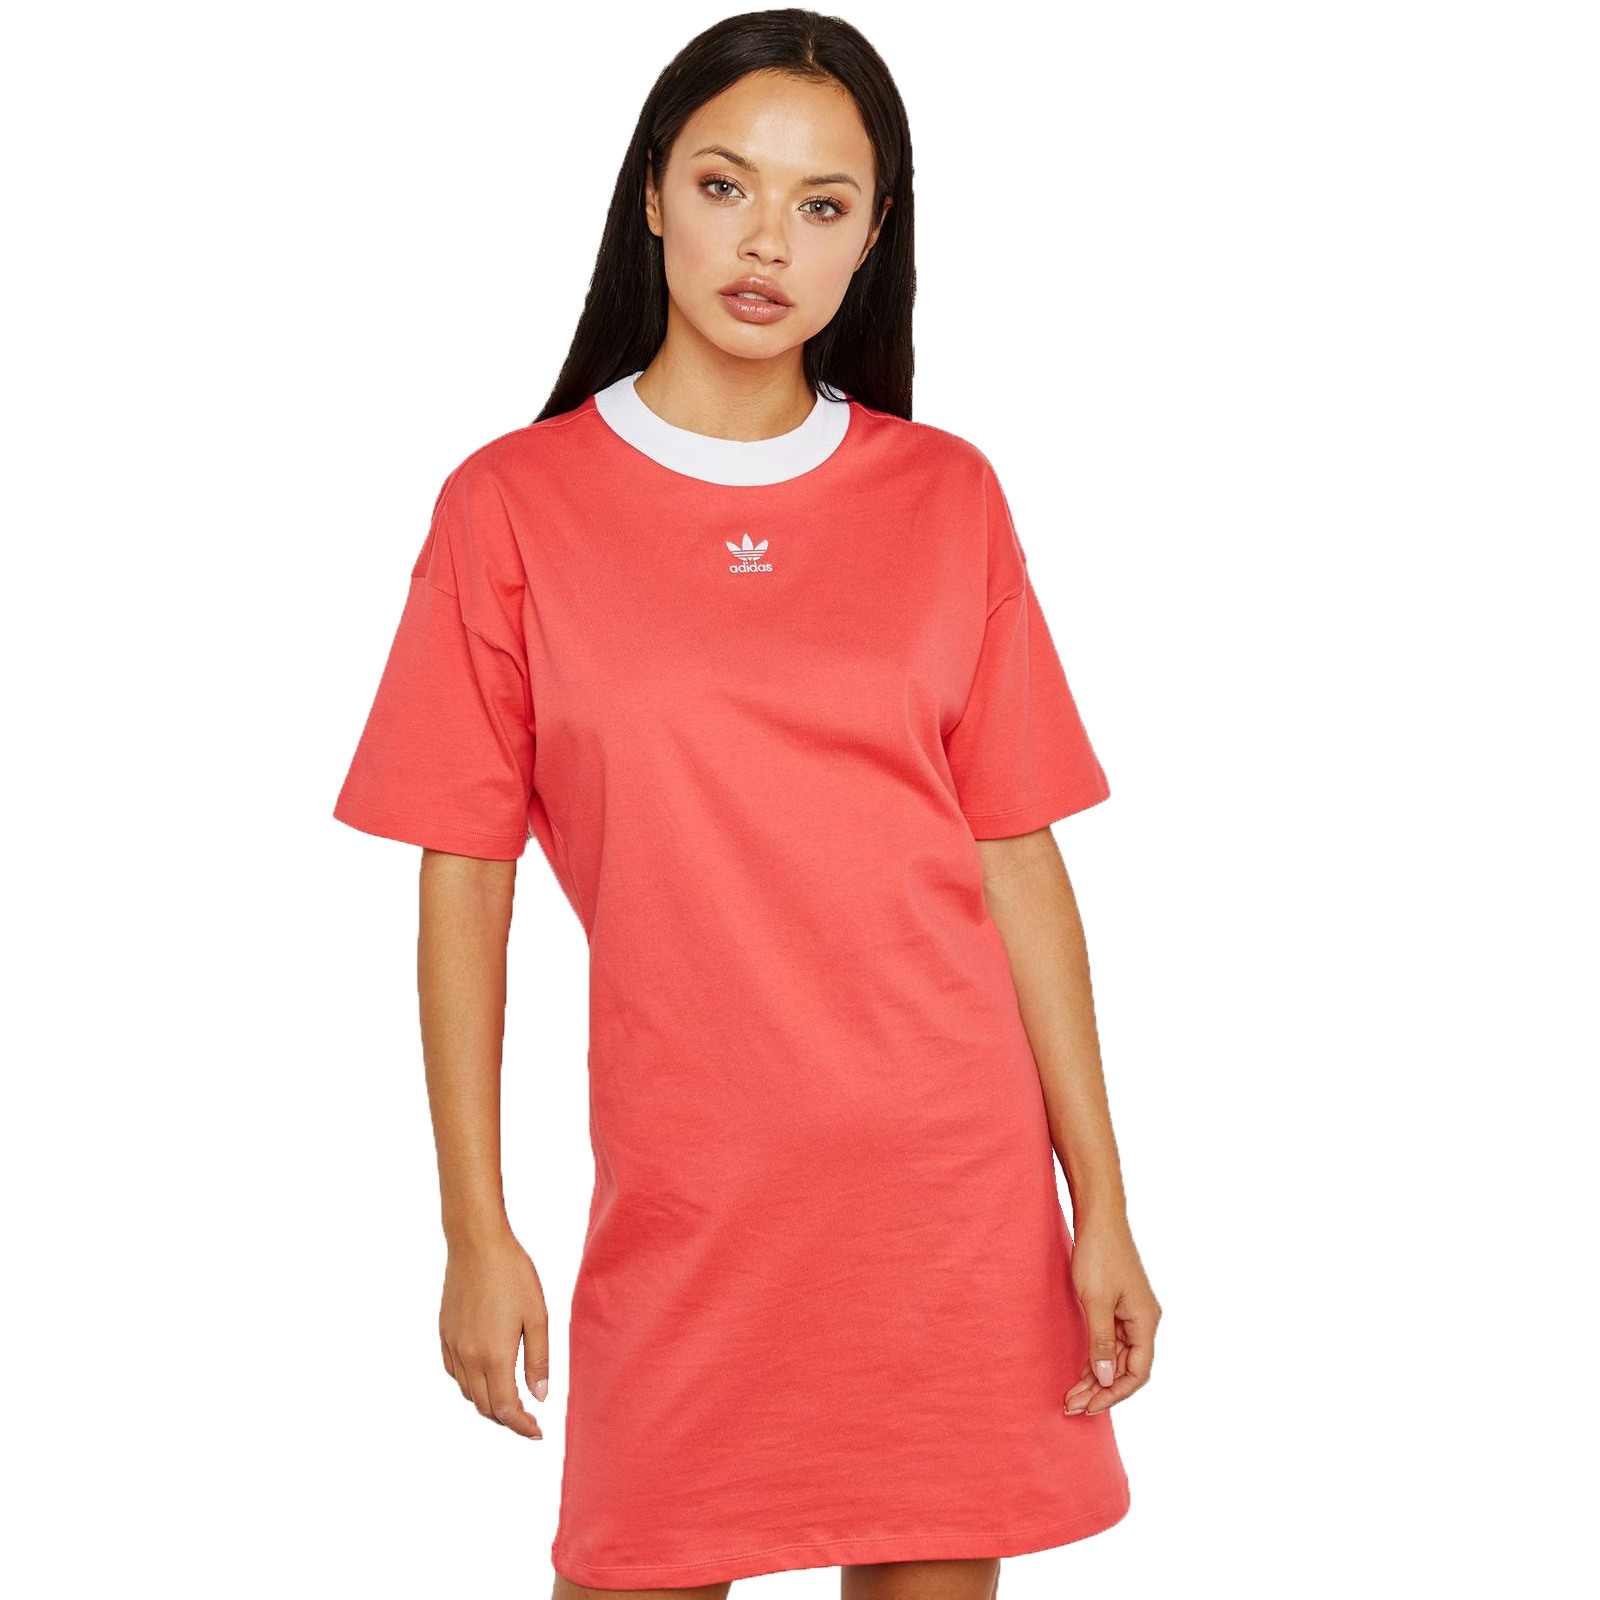 Adidas Originals Trefoil Tee Dress Kleid Longshirt